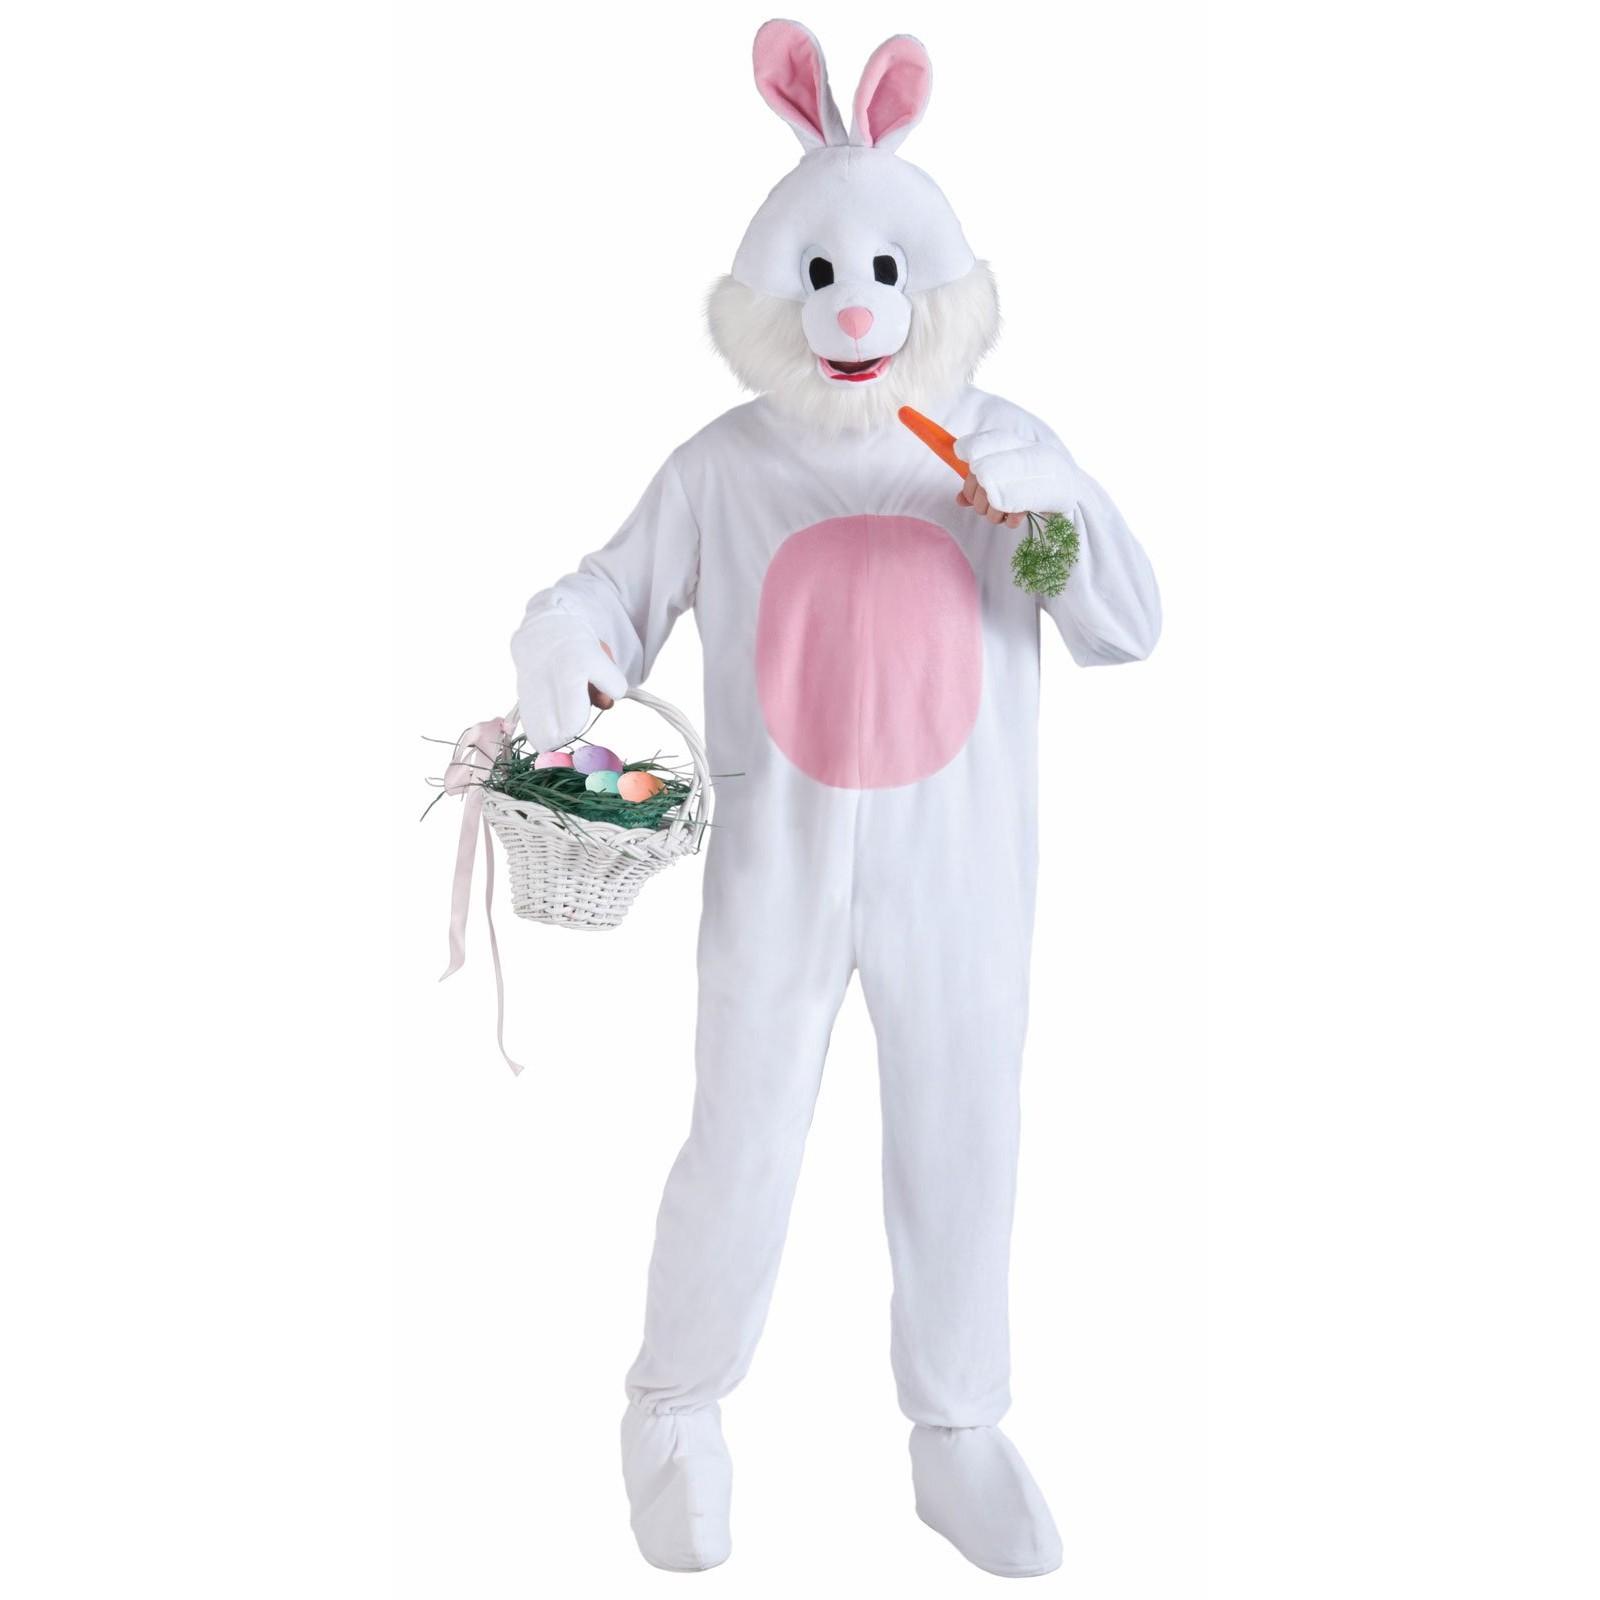 56bfbf8b Easter Bunny Costumes - Walmart.com